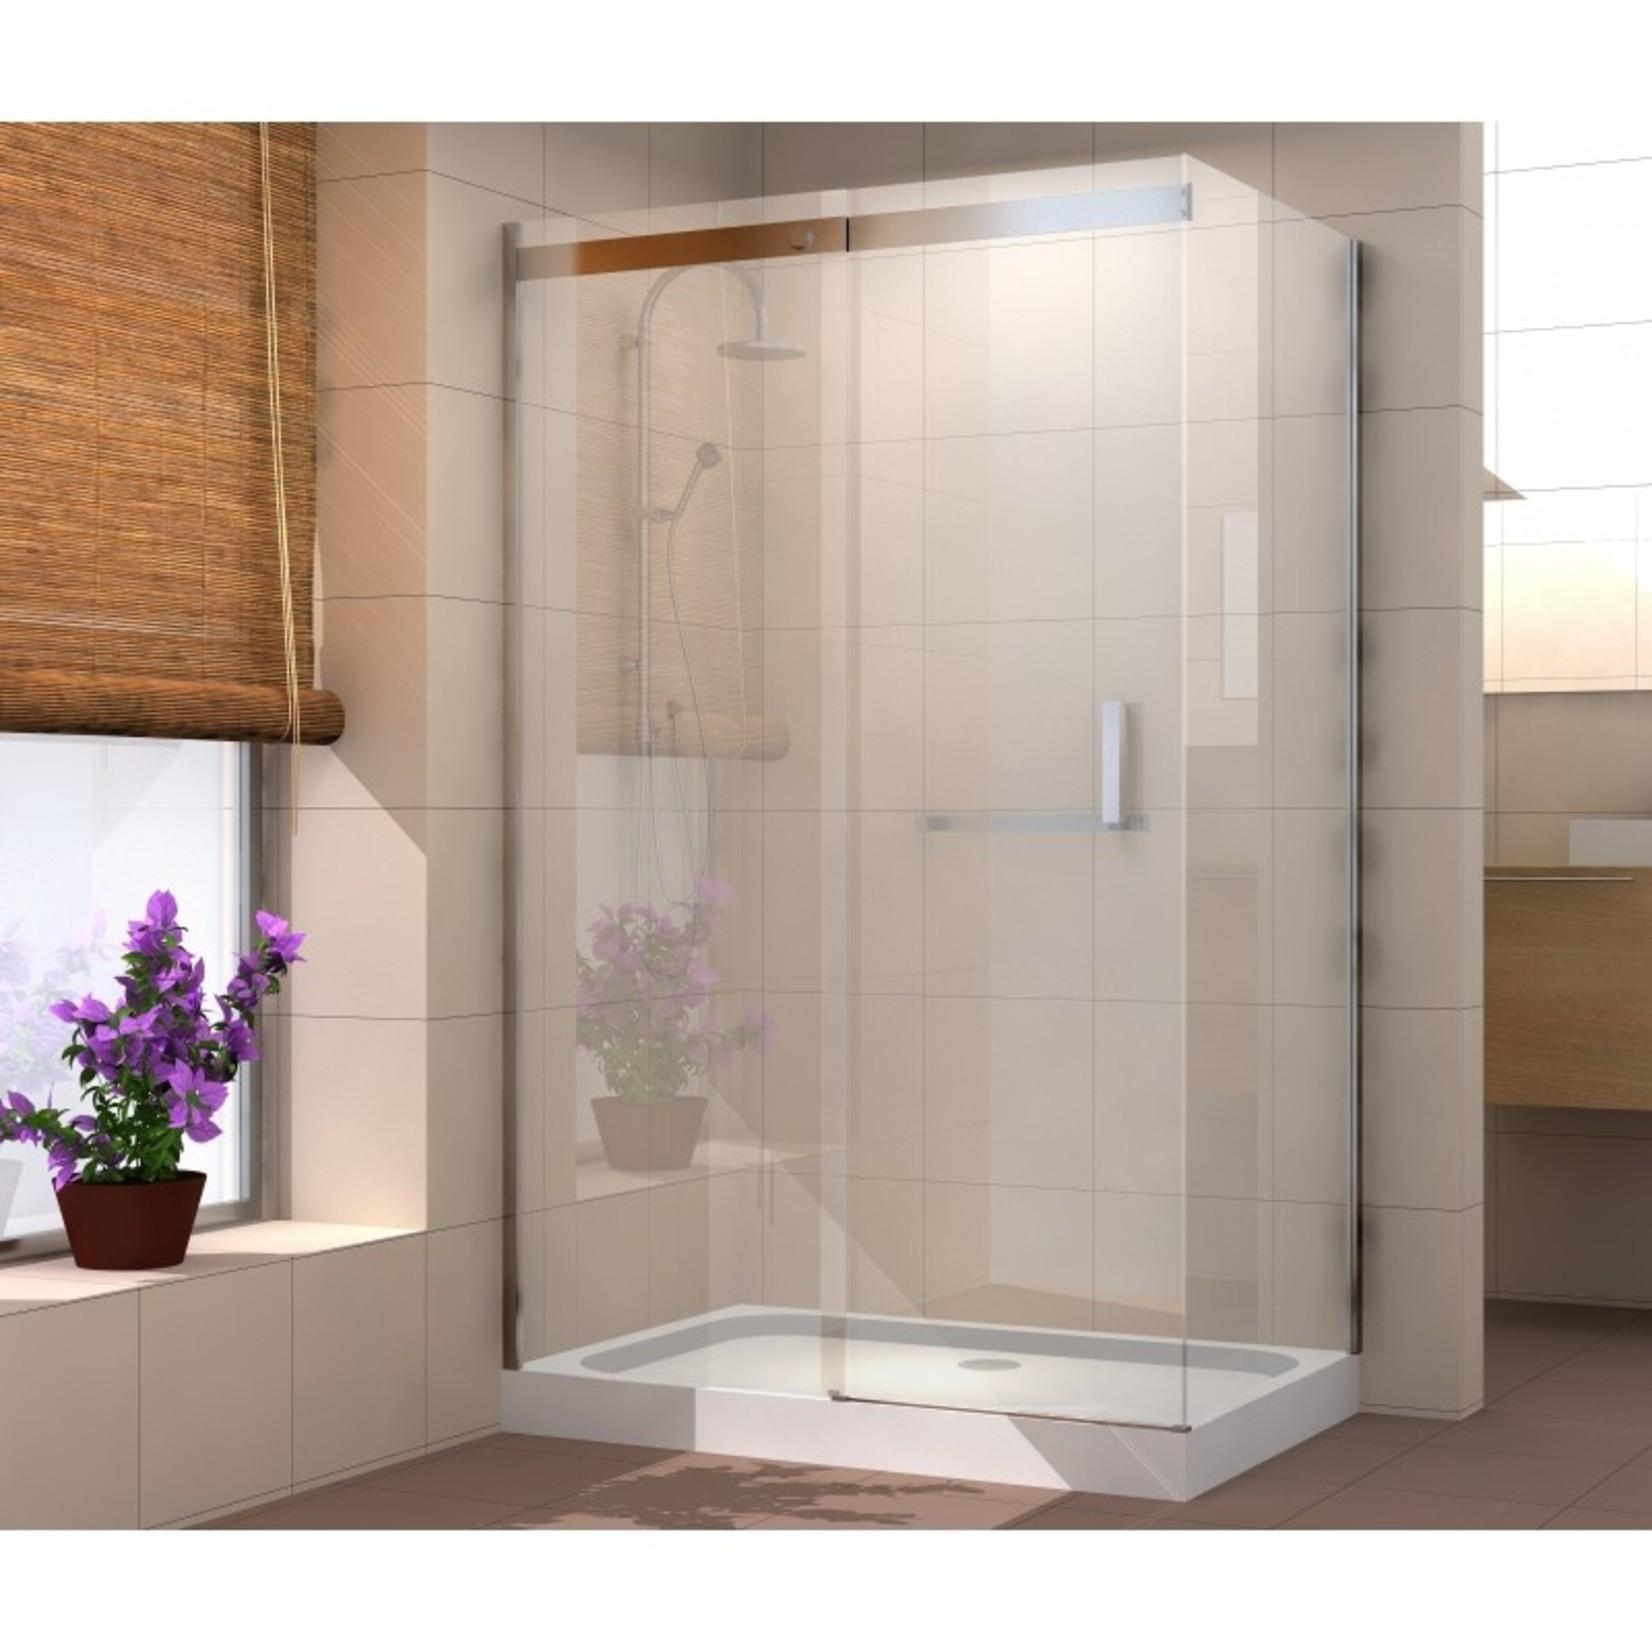 36x48 brushed nickel shower set quartz ocea